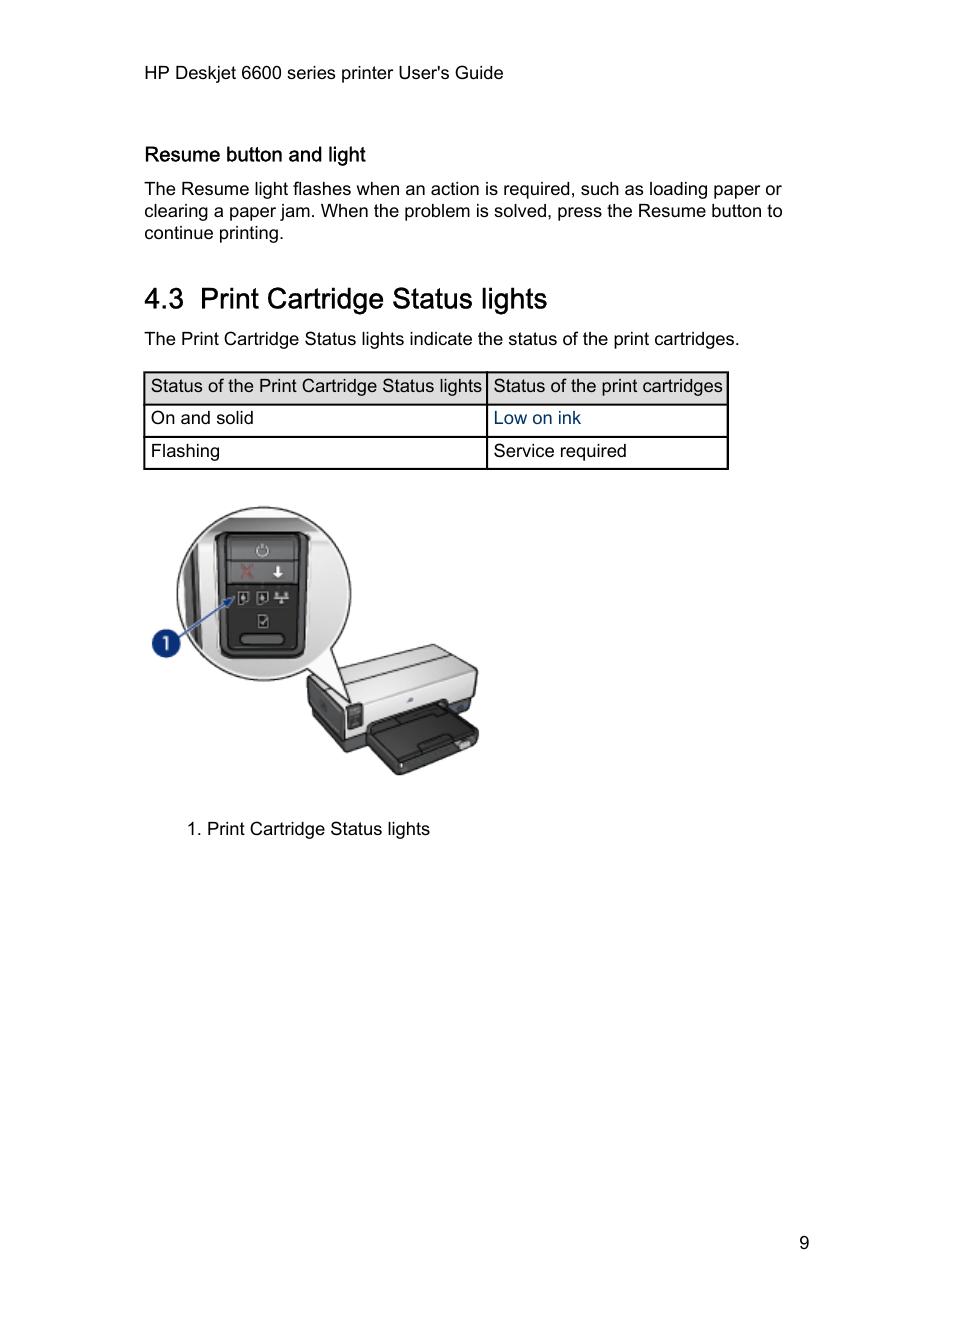 resume button and light 3 print cartridge status lights print